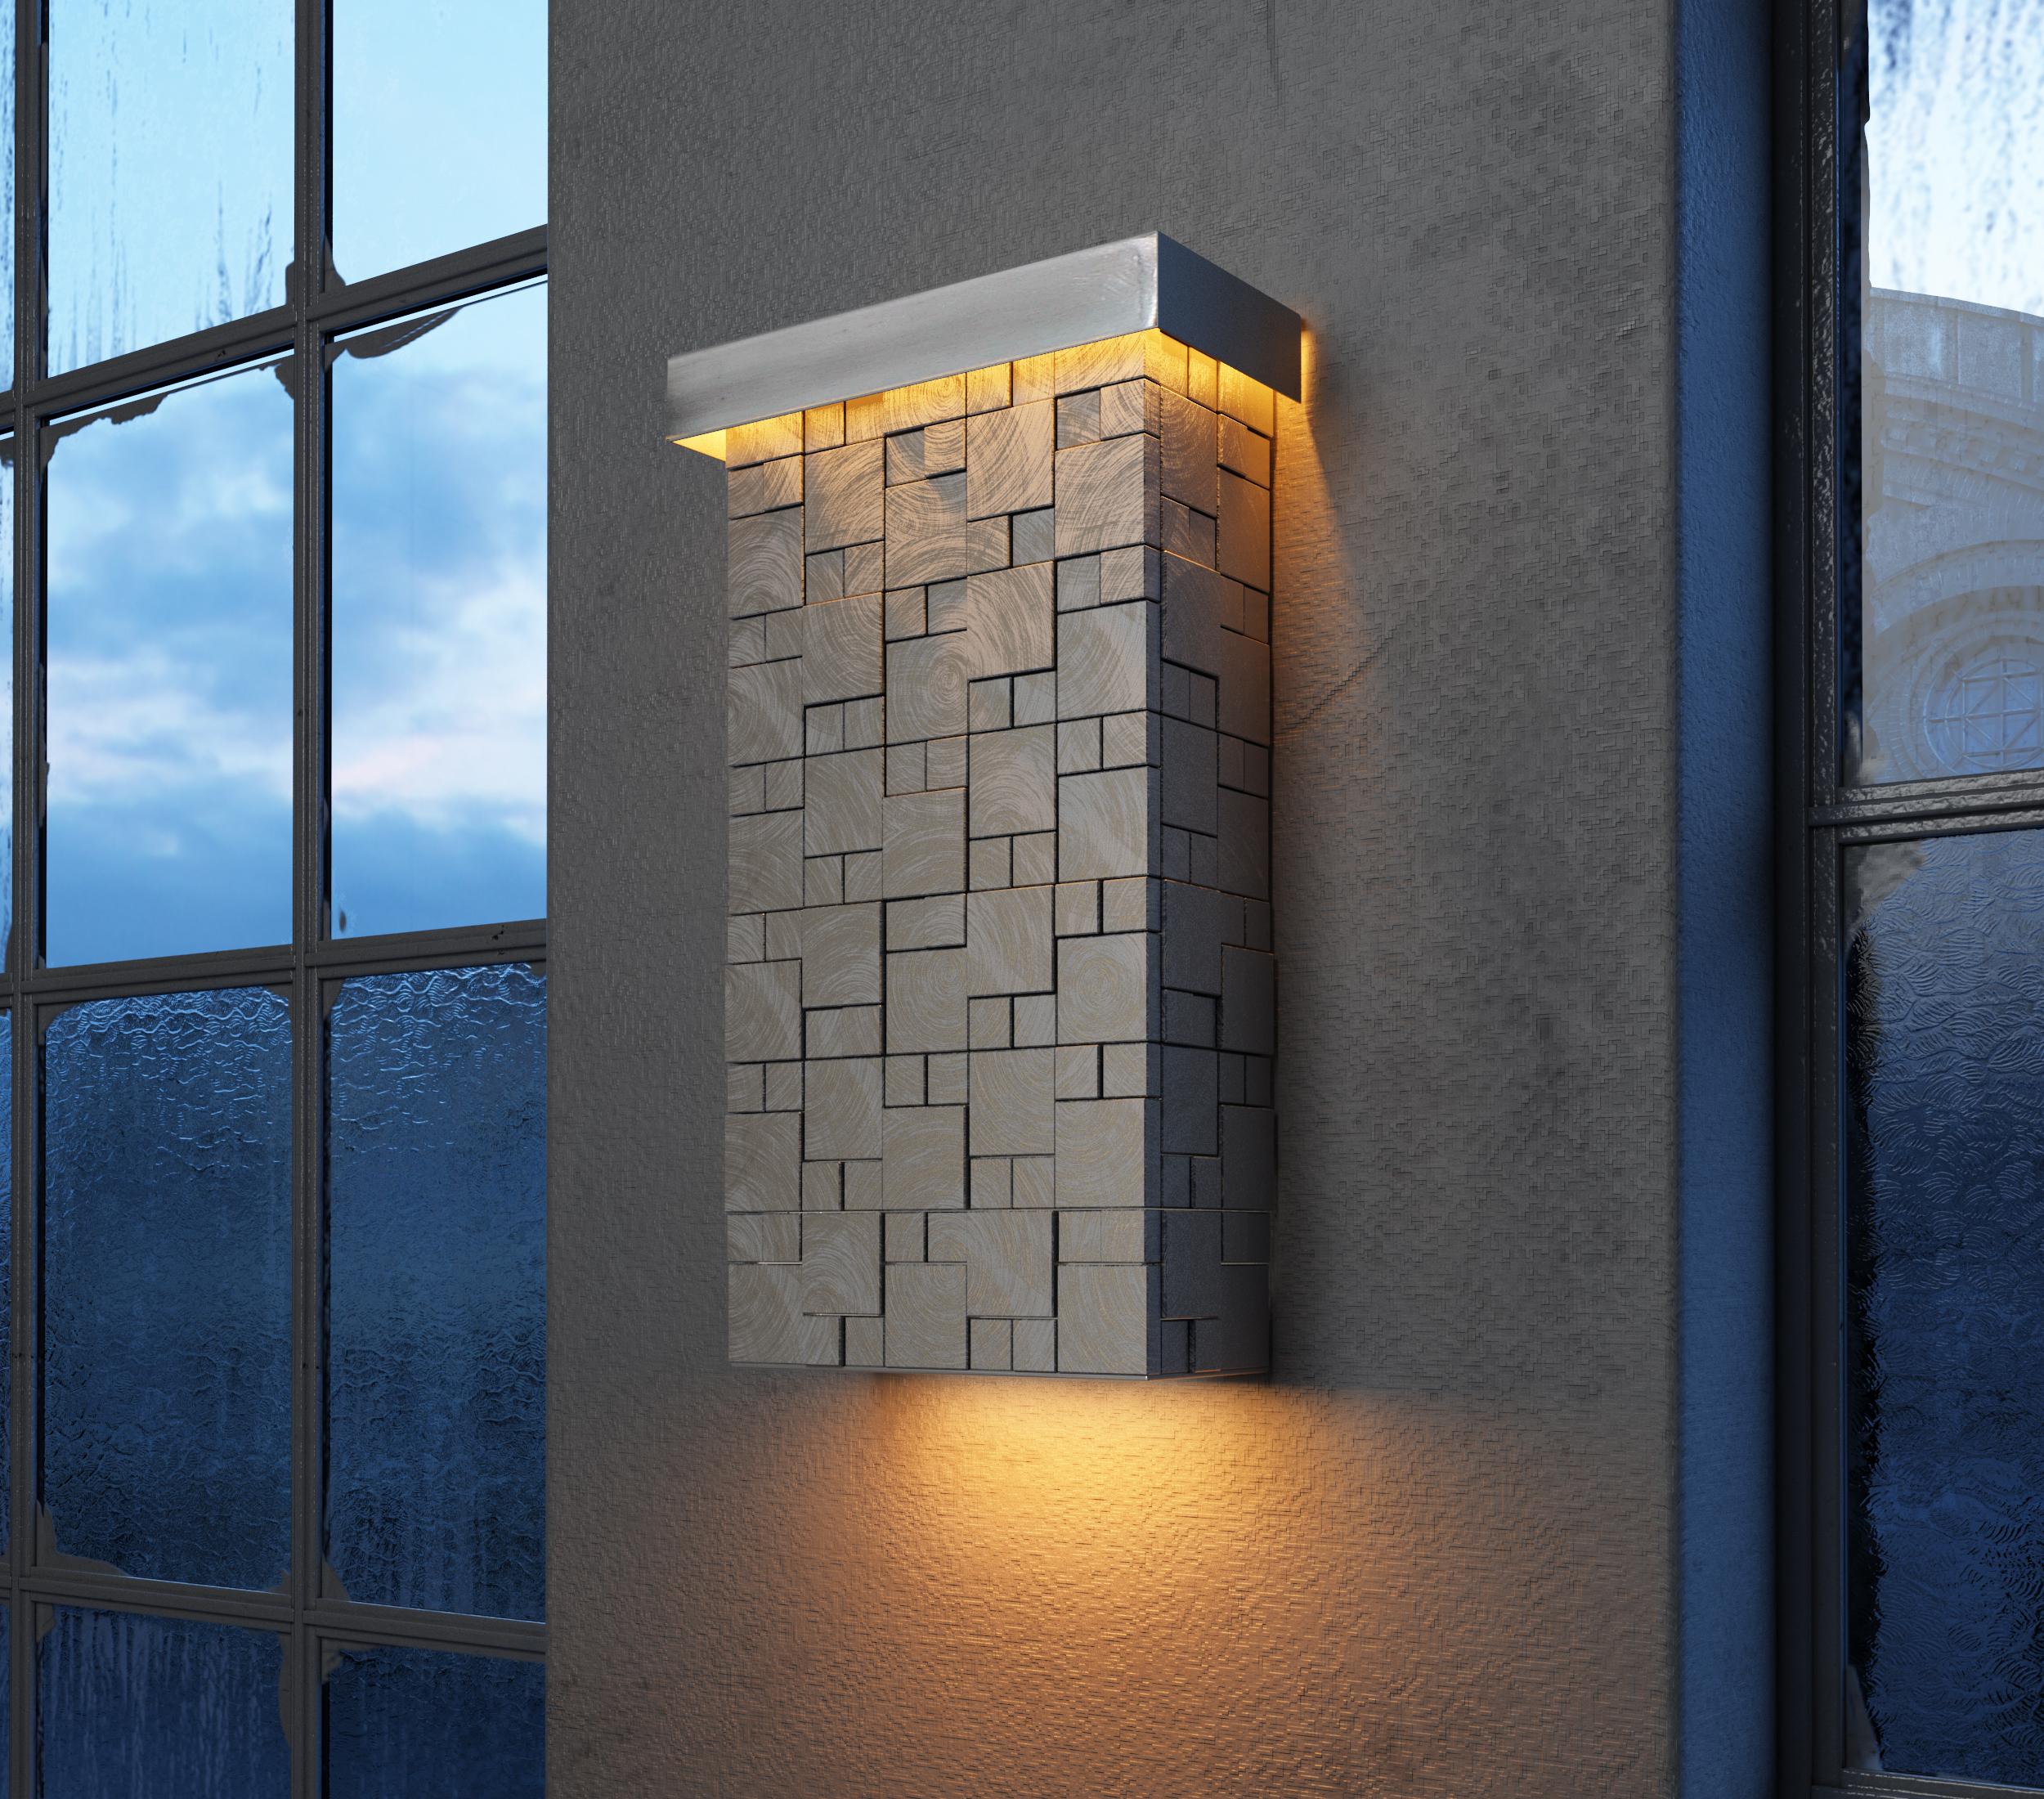 Mosaic led wall sconce wall sconce maxim lighting mosaic led wall sconce amipublicfo Images